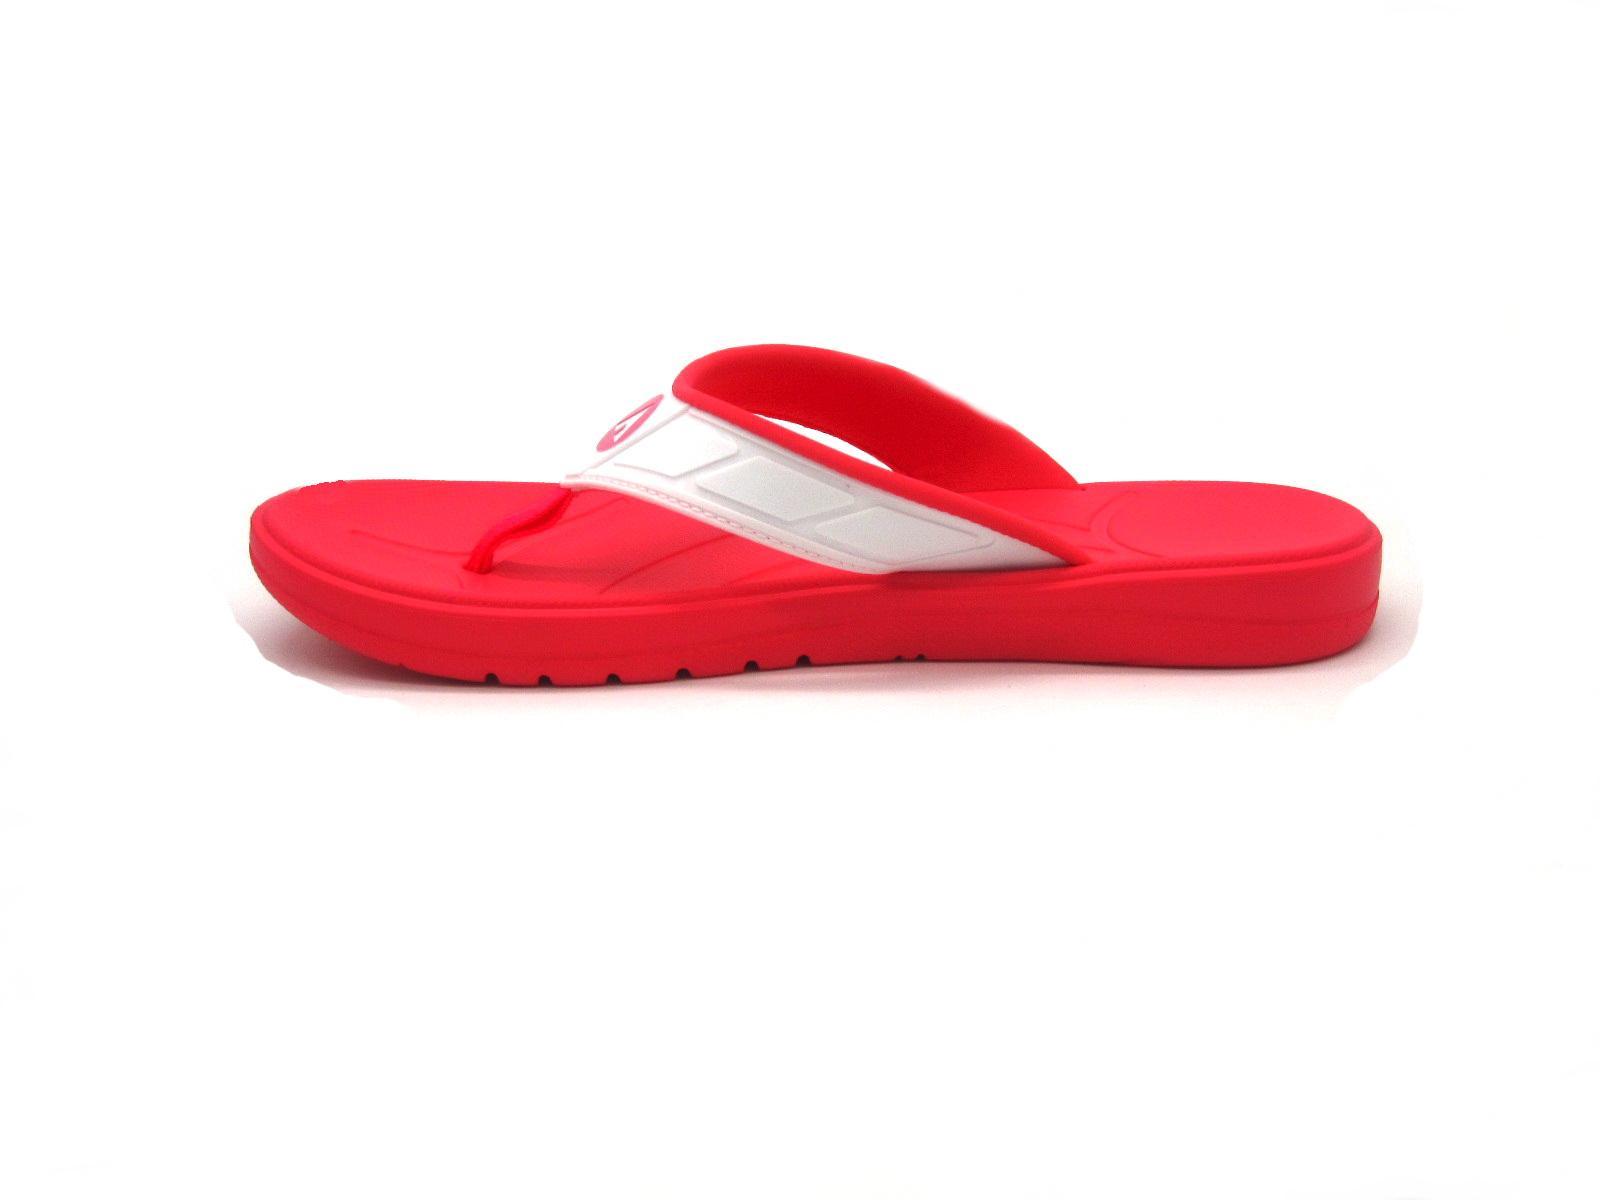 7f9ff1b4803e Flip Flops for Women for sale - Womens Flip Flops online brands ...